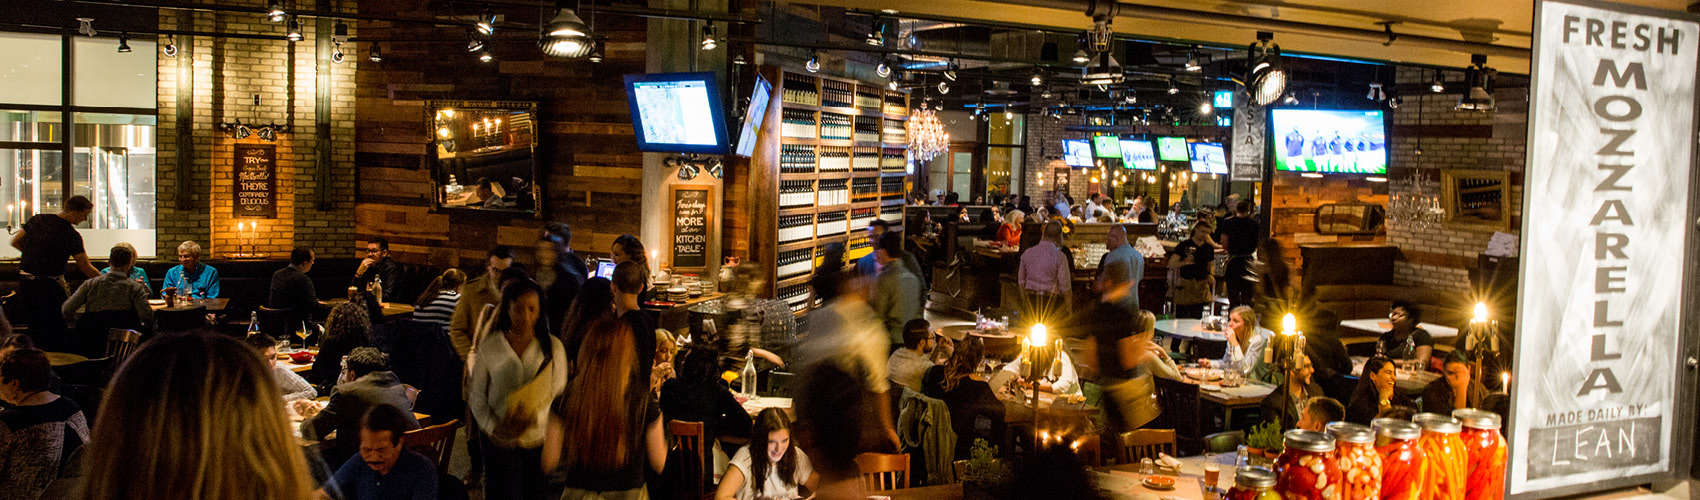 Scaddabush - Italian Restaurant Front Street Toronto